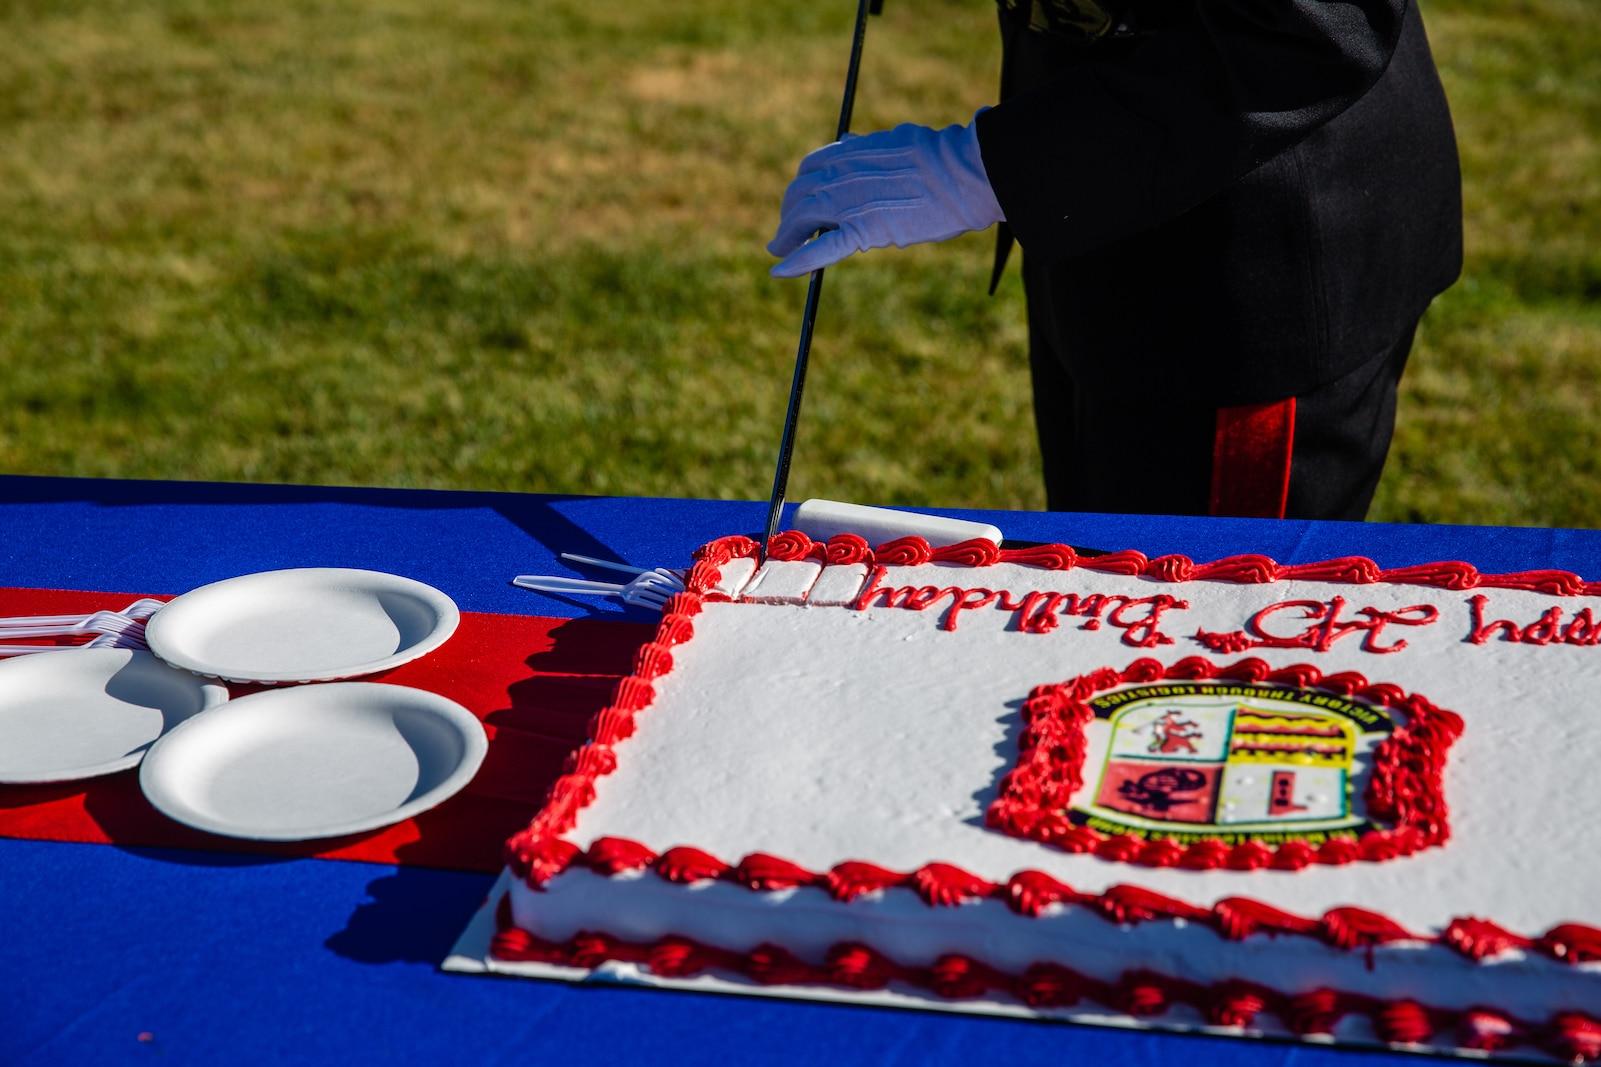 U.S. Marine Corps Brig. Gen. Bobbi Shea, commanding general, 1st Marine Logistics Group, I Marine Expeditionary Force, cuts the cake during the 1st MLG Cake-Cutting Ceremony at Camp Pendleton California, Nov. 9, 2020.